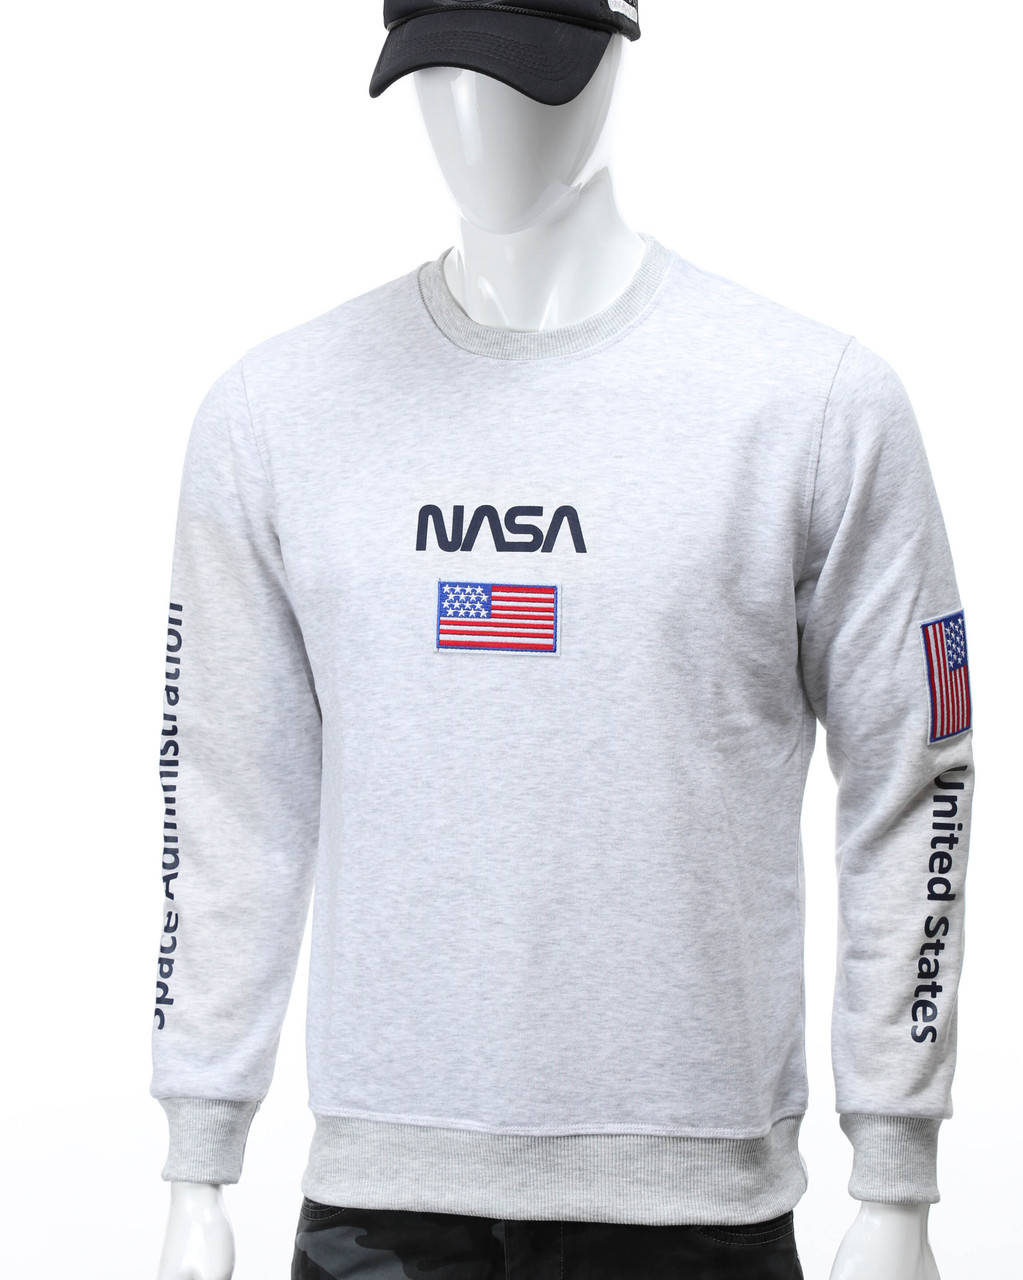 Свитшот бел меланж NASA №5 патч, рис на рукавах WTGRI L(Р) 20-522-001-003